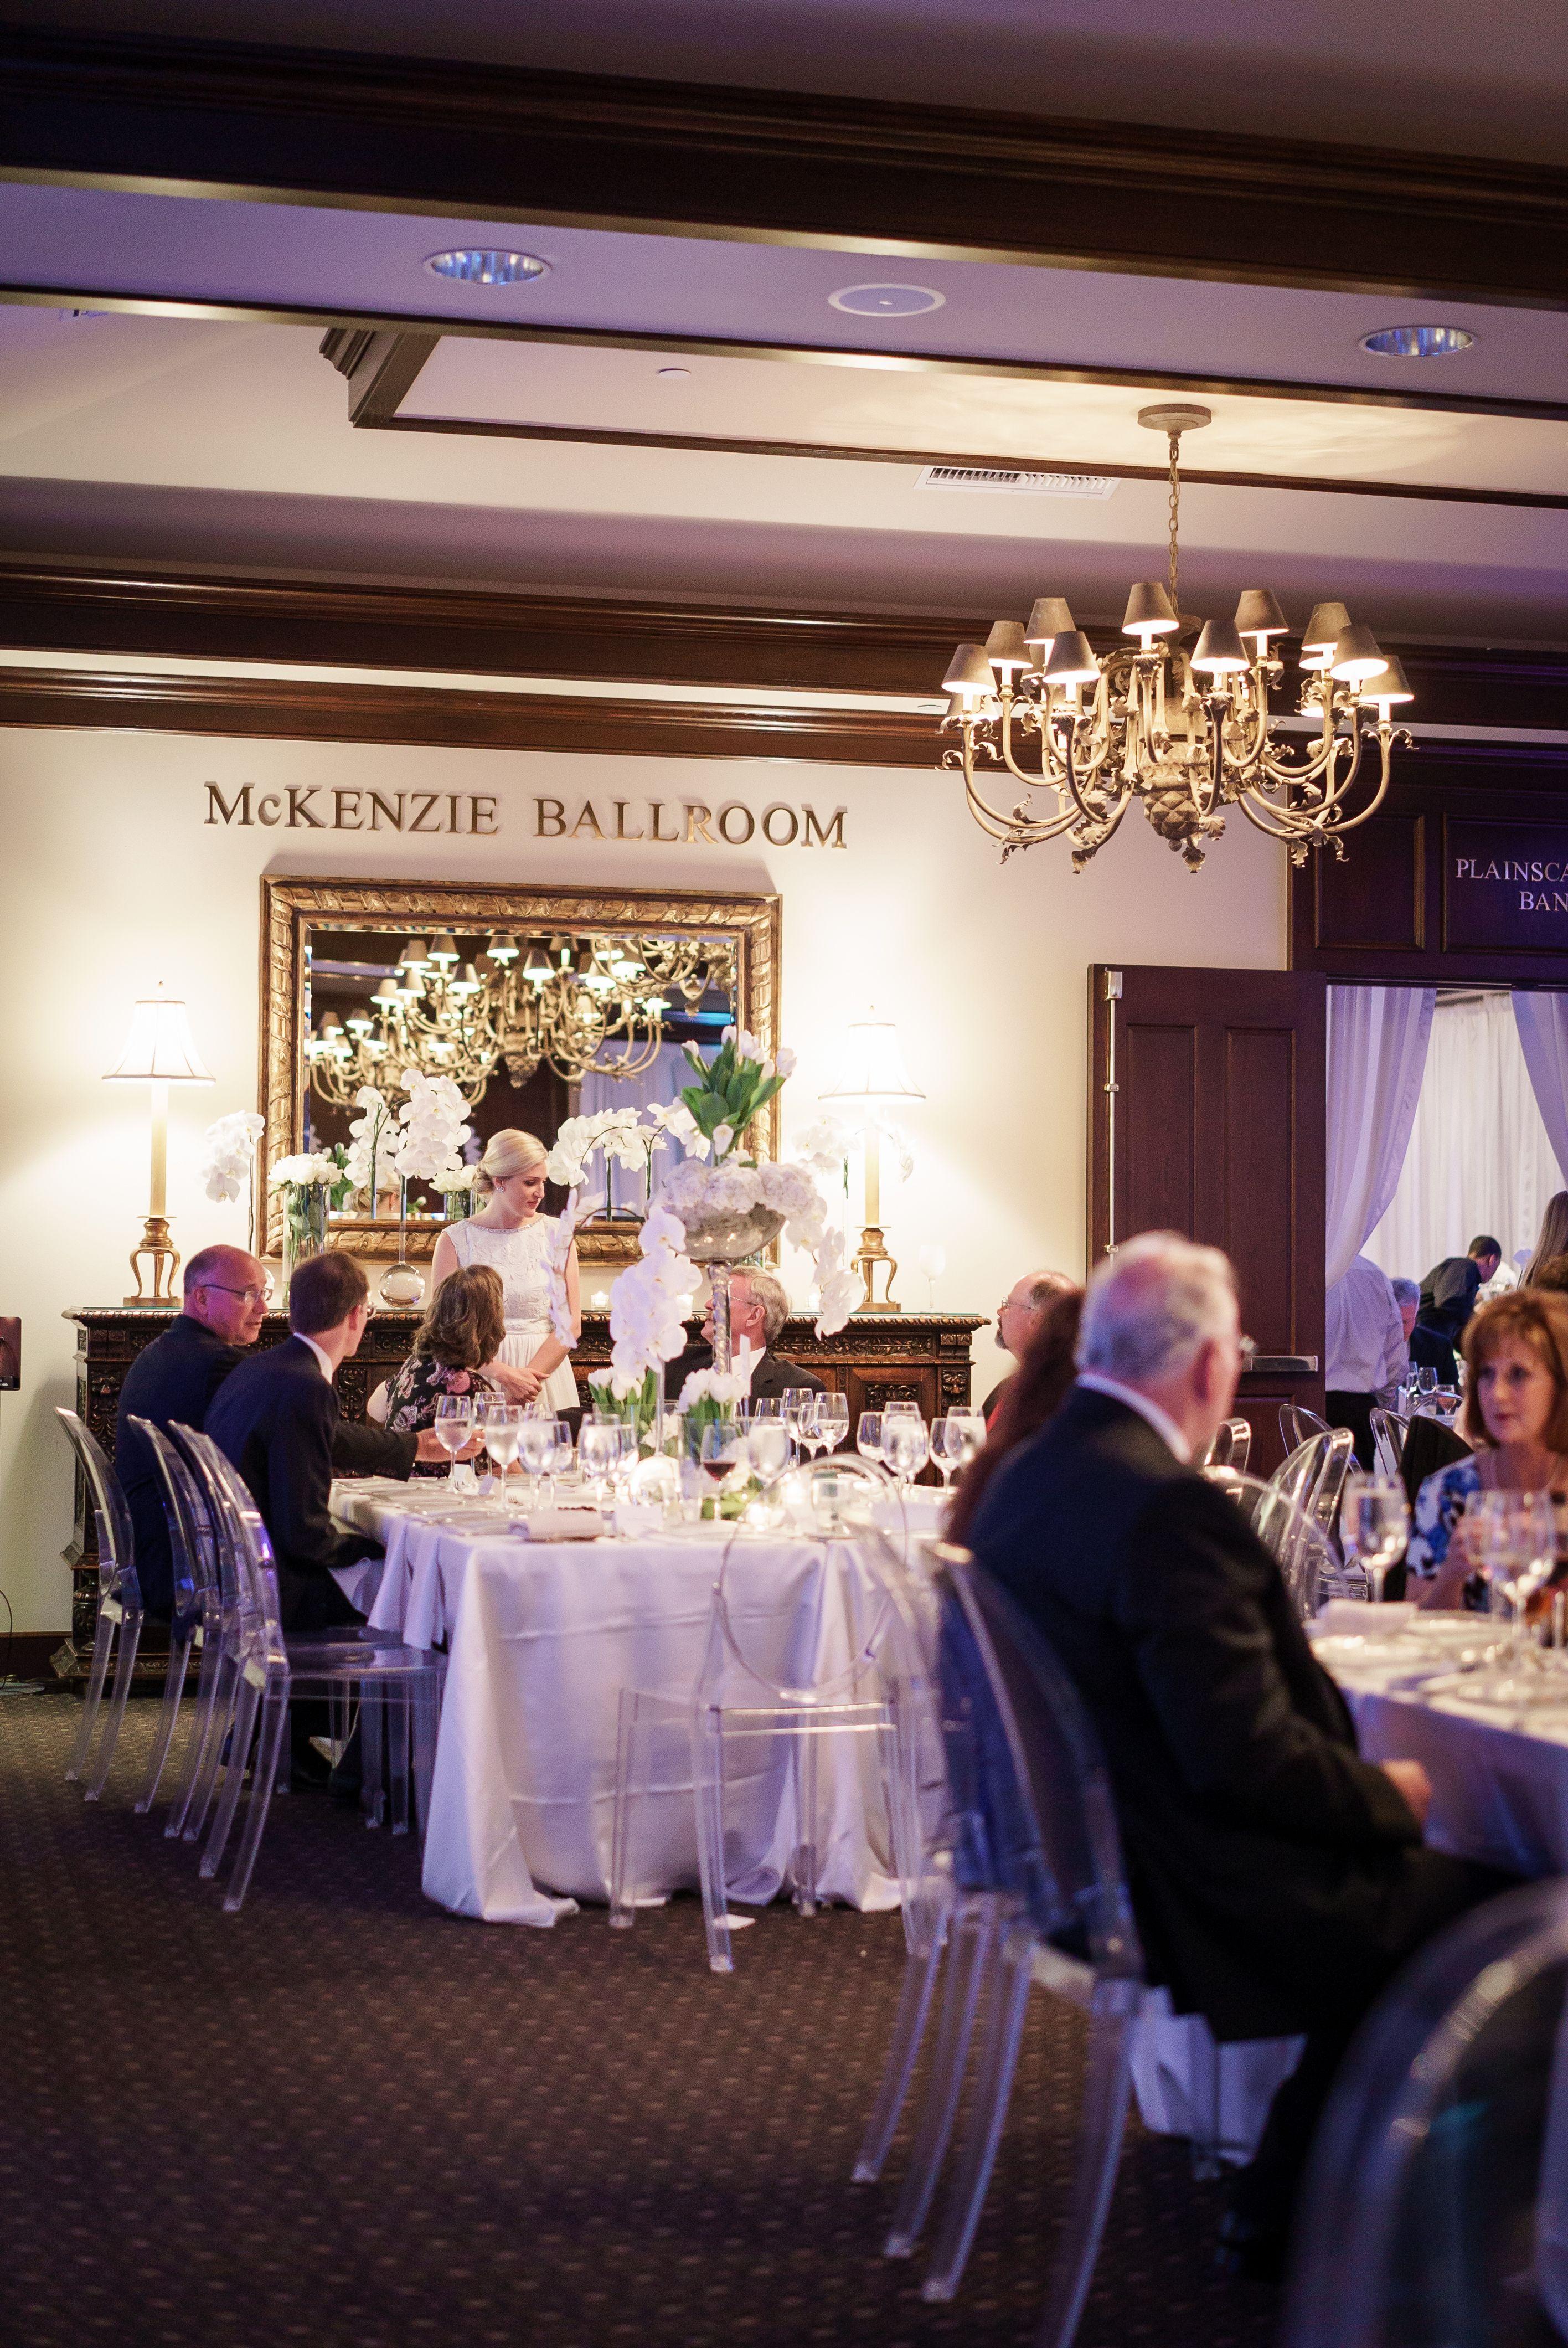 Kirkpatrick Wedding Mckenzie Merket Top Tier Catering Florals By Avante Photography By S Outdoor Reception Texas Tech University Campus Texas Tech Alumni